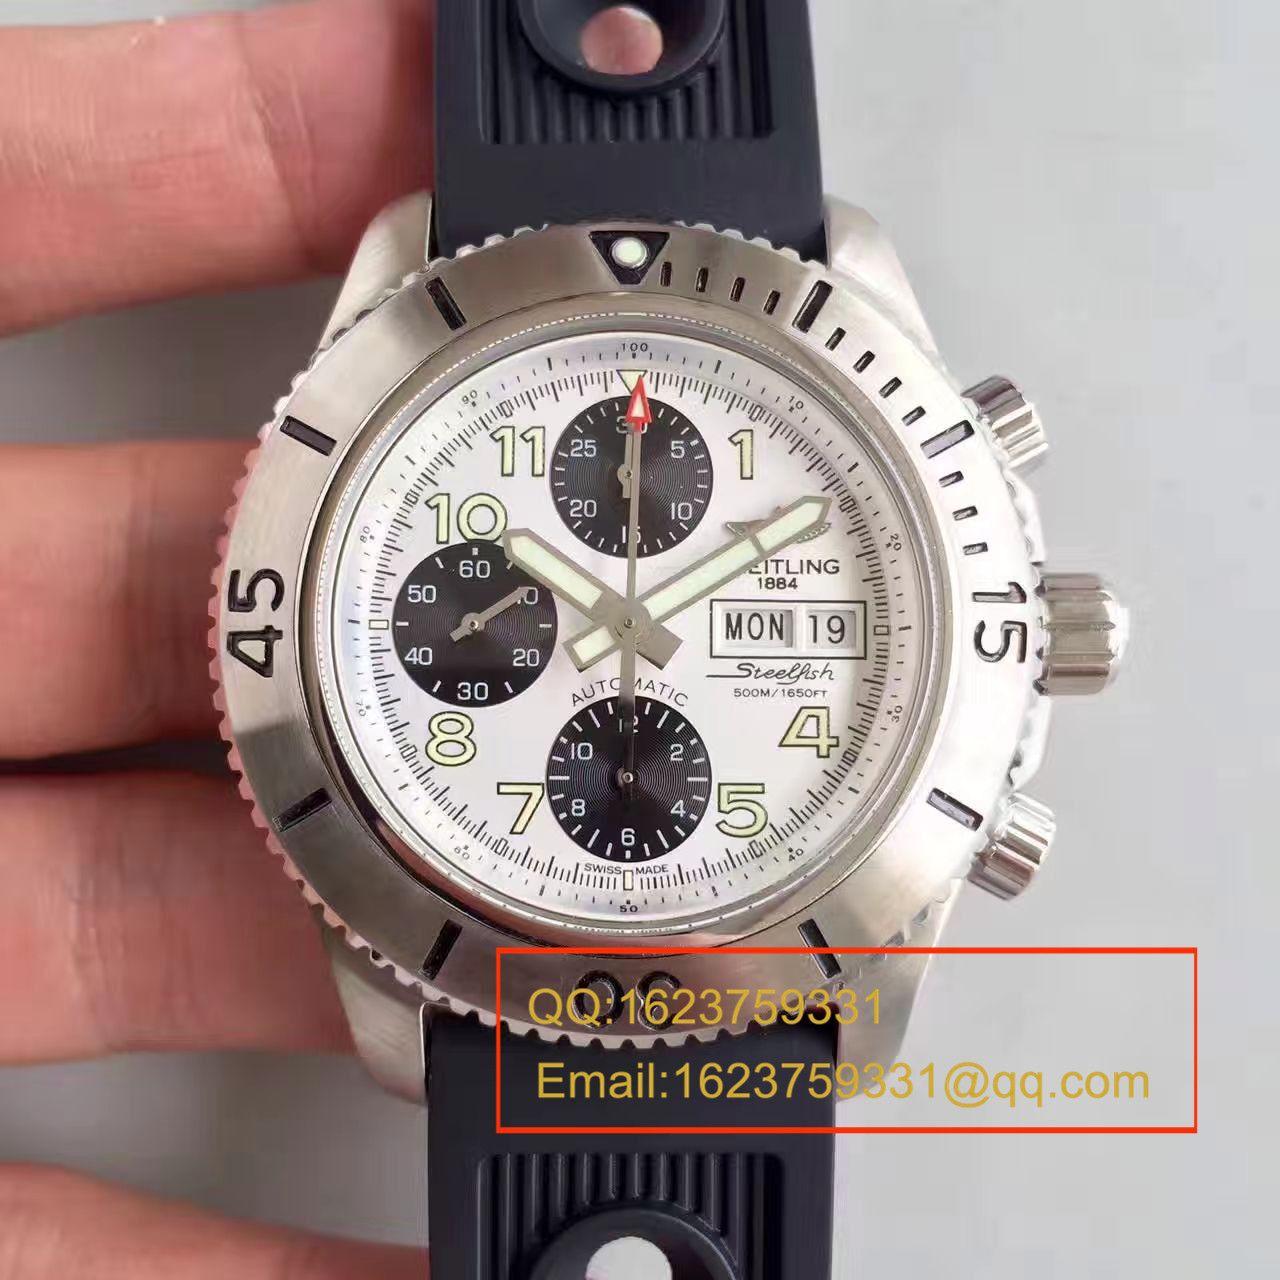 【GF一比一超A精仿手表】百年灵超级海洋系列A13341C3/C893/200S/A20DSA.2钢鱼计时腕表